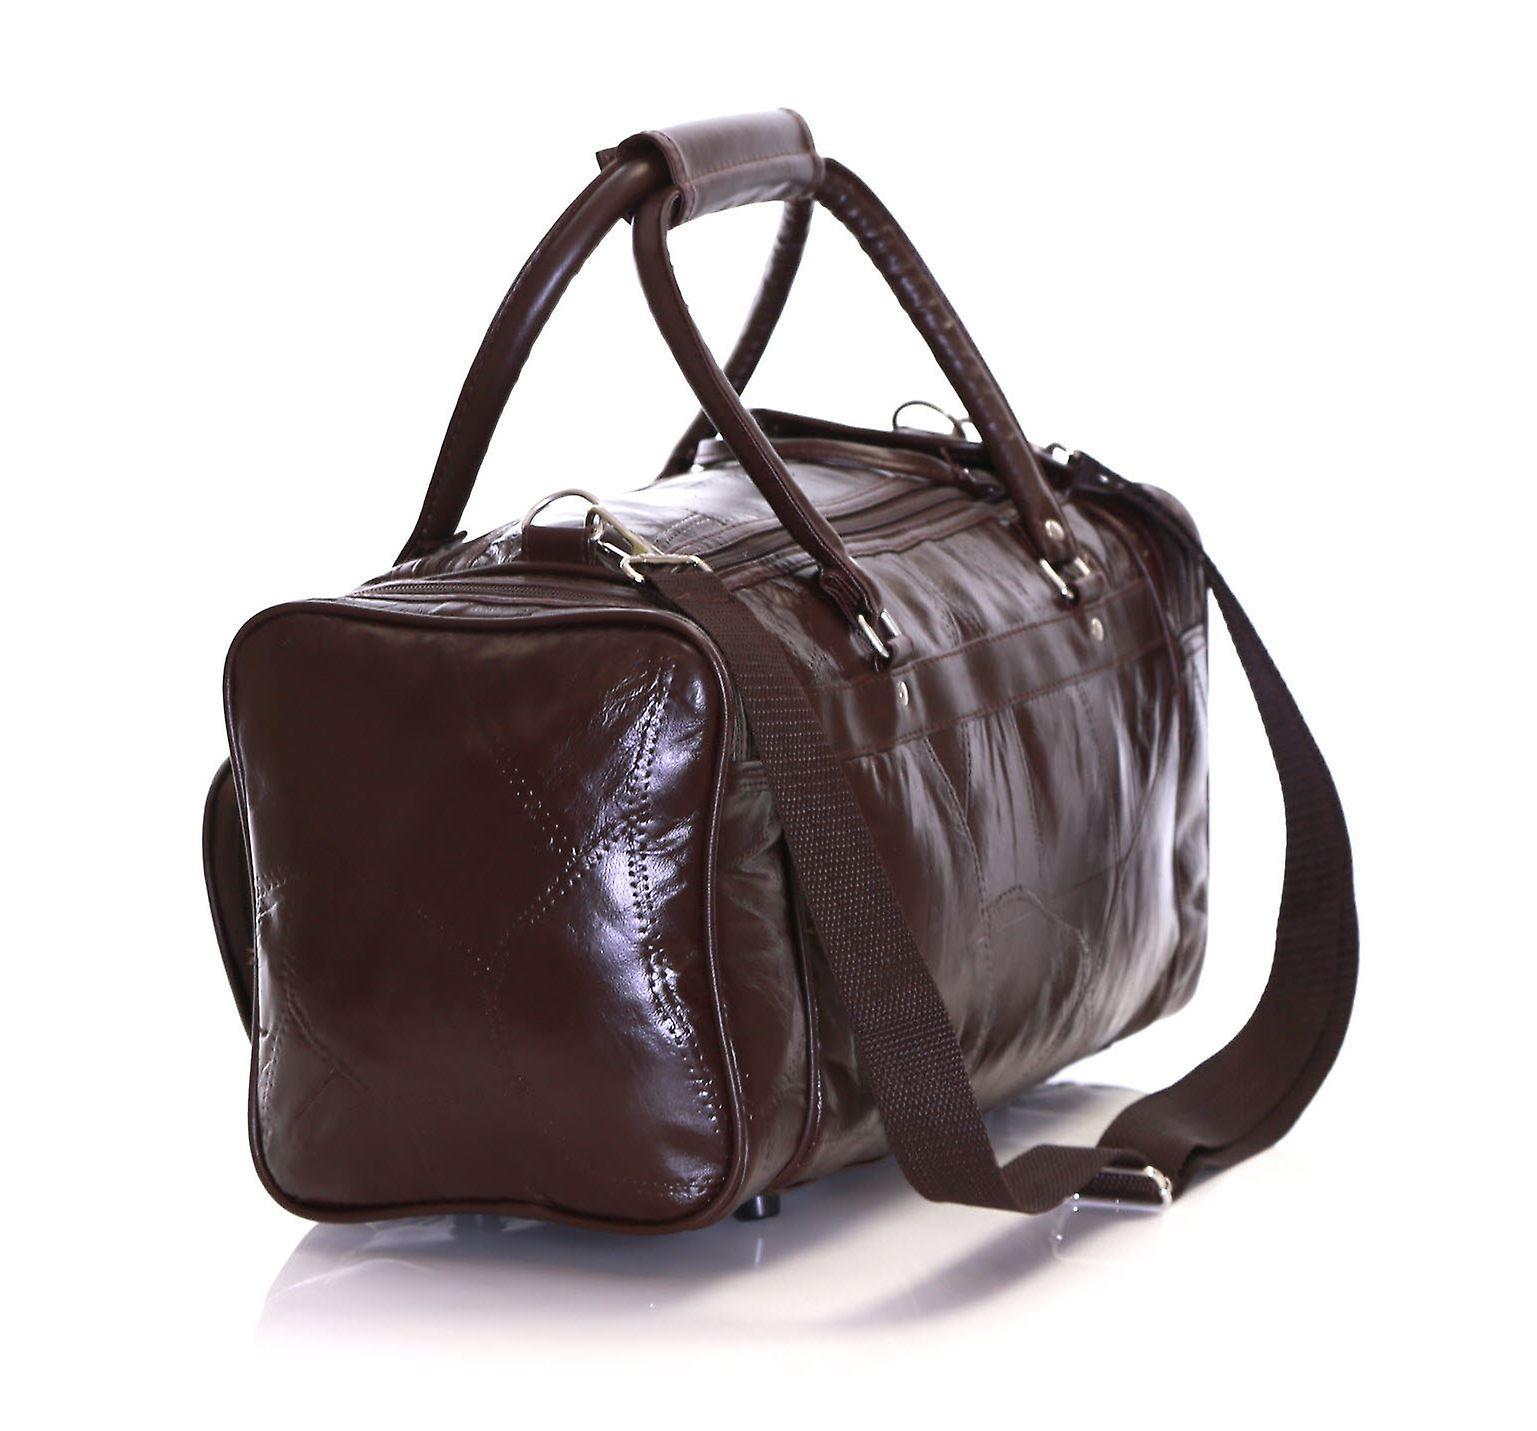 Slimbridge Blumberg Leather Travel Bag, Brown